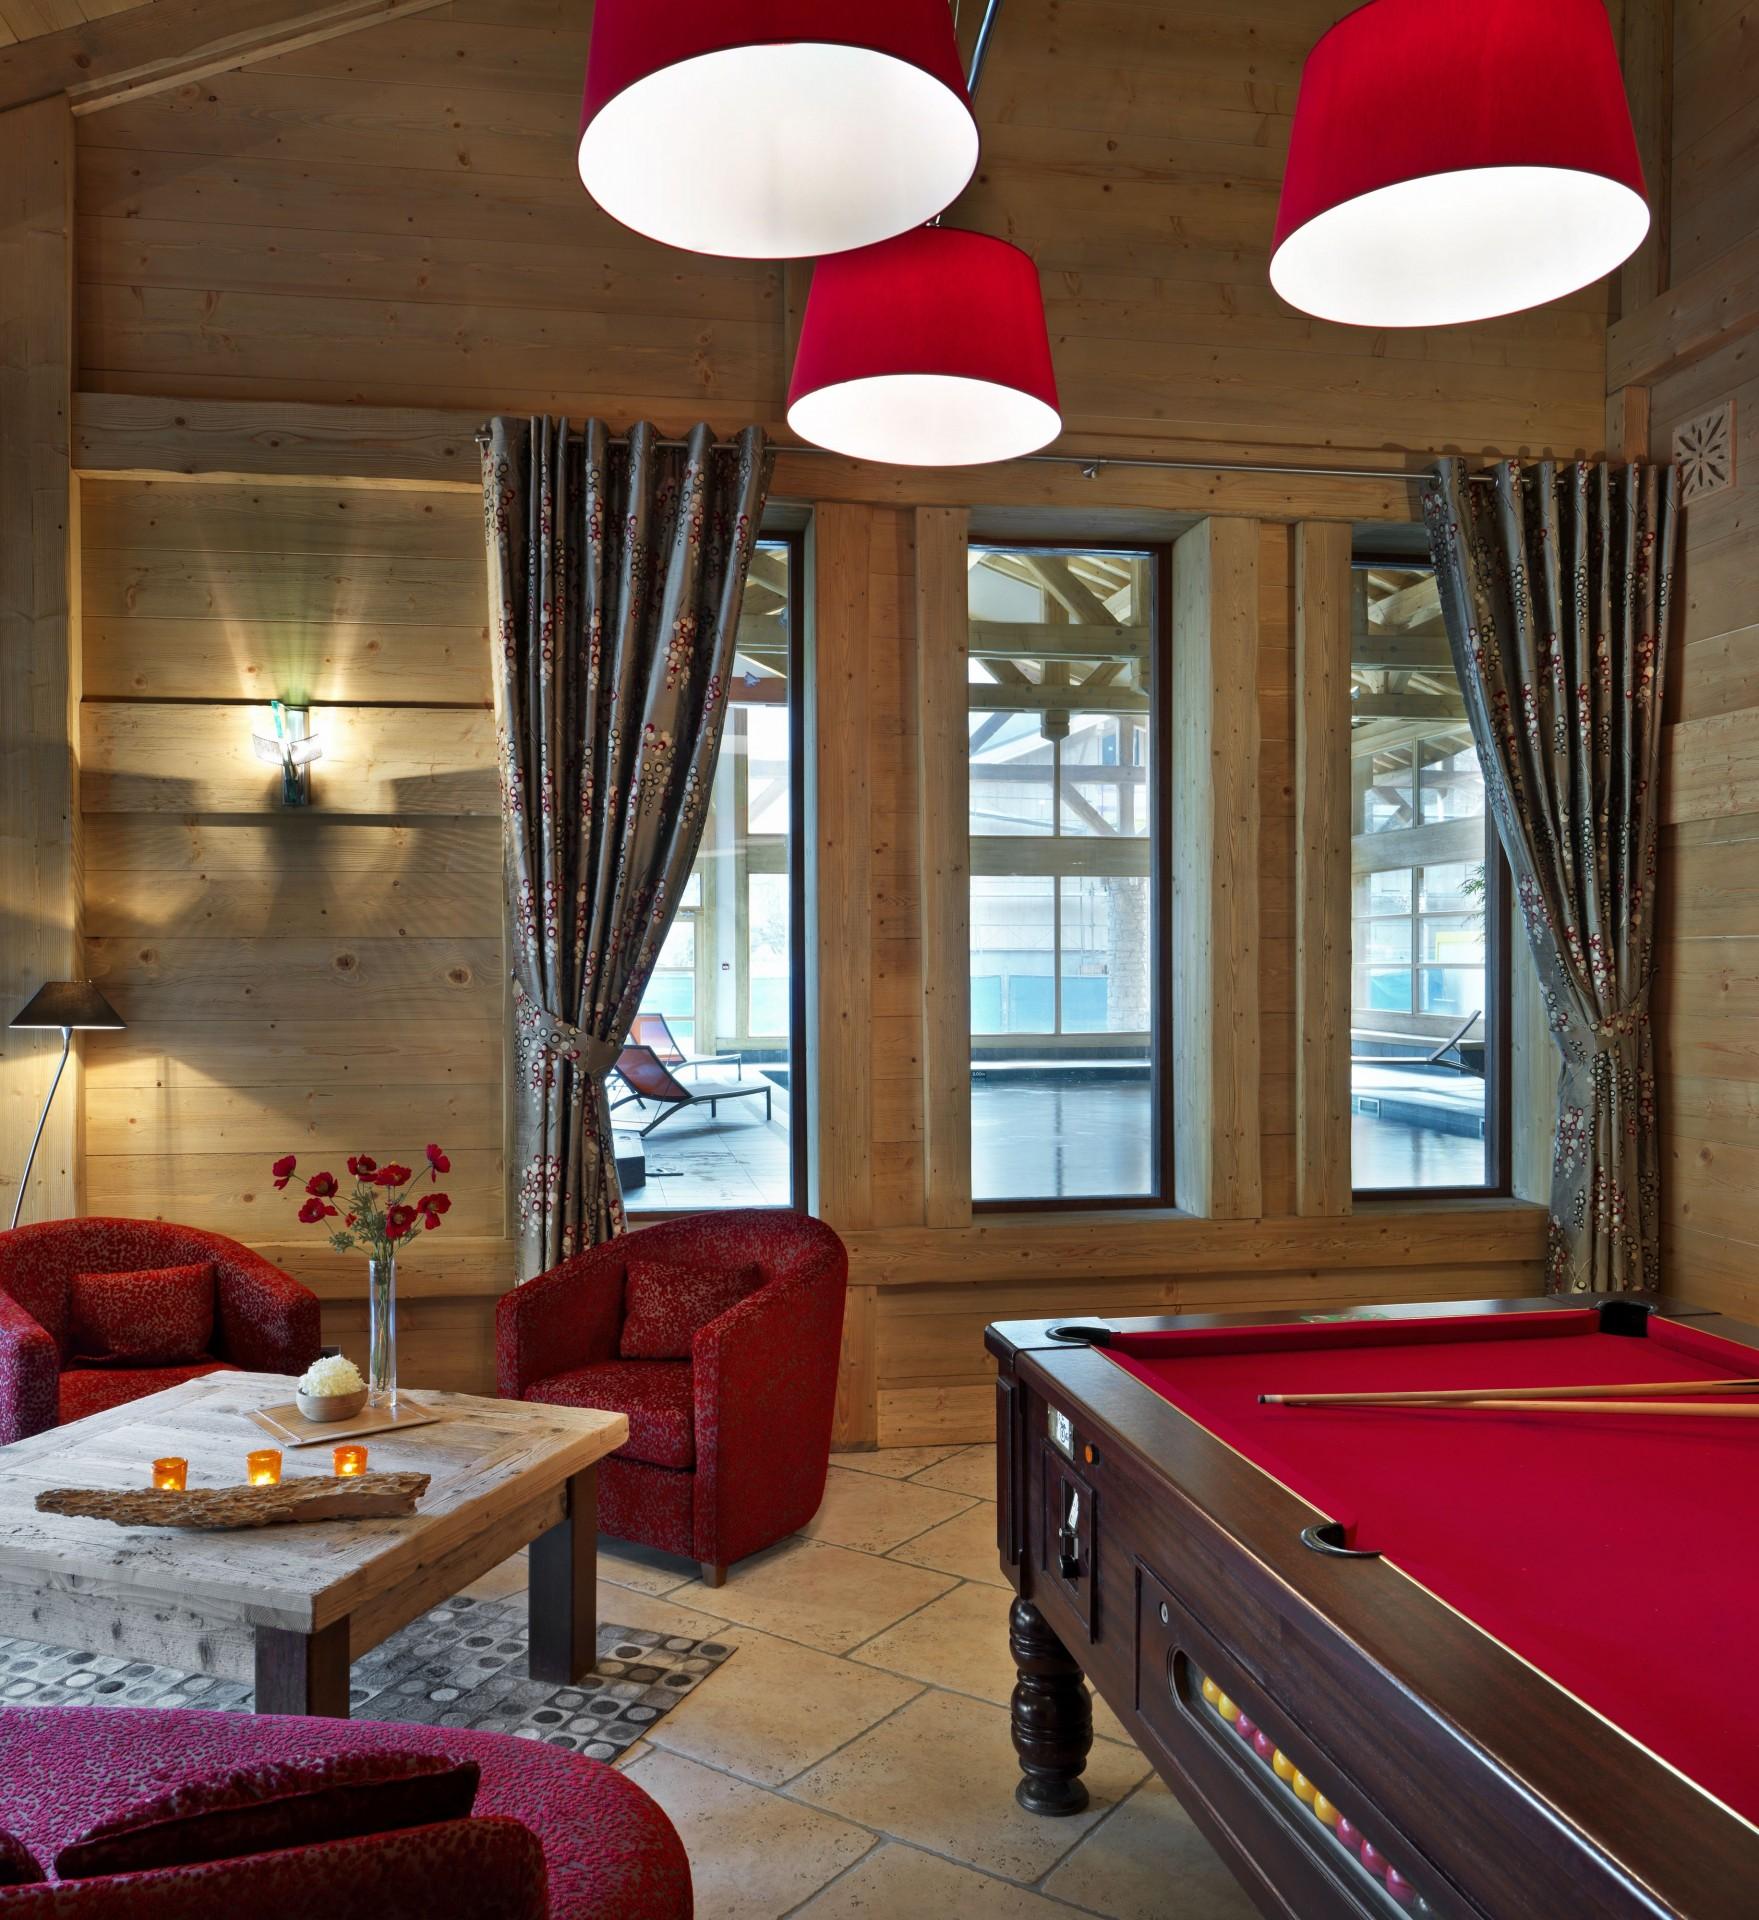 Samoens Location Appartement Luxe Salis Réception